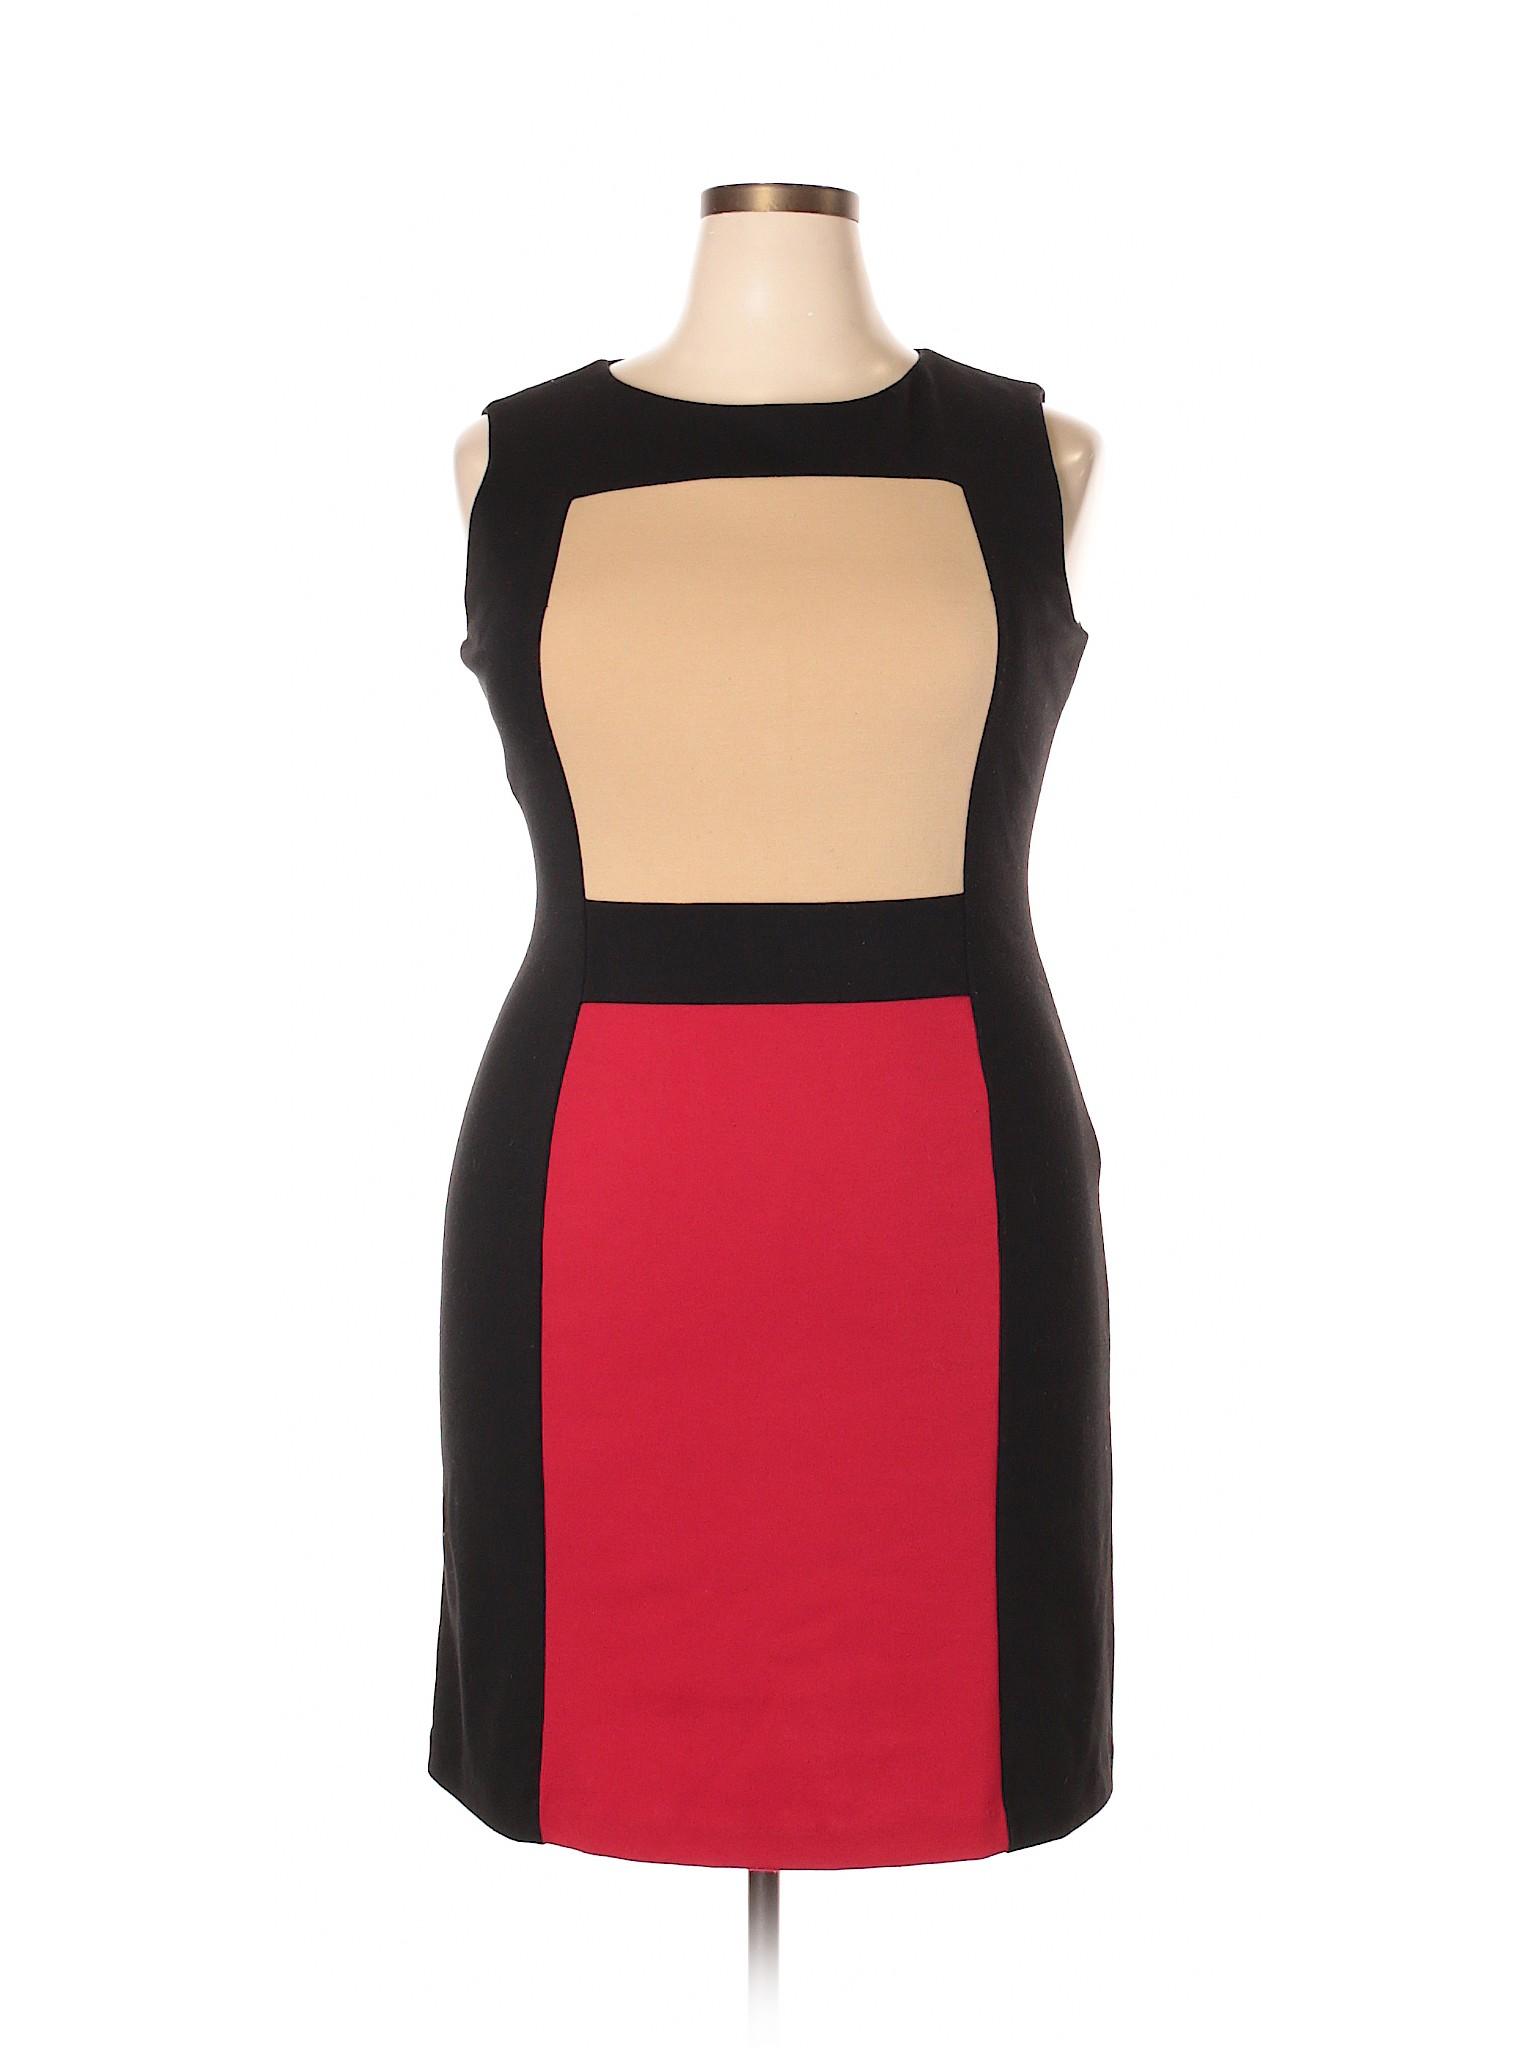 Klein Casual winter Dress Calvin Boutique 1EPqRxAxw